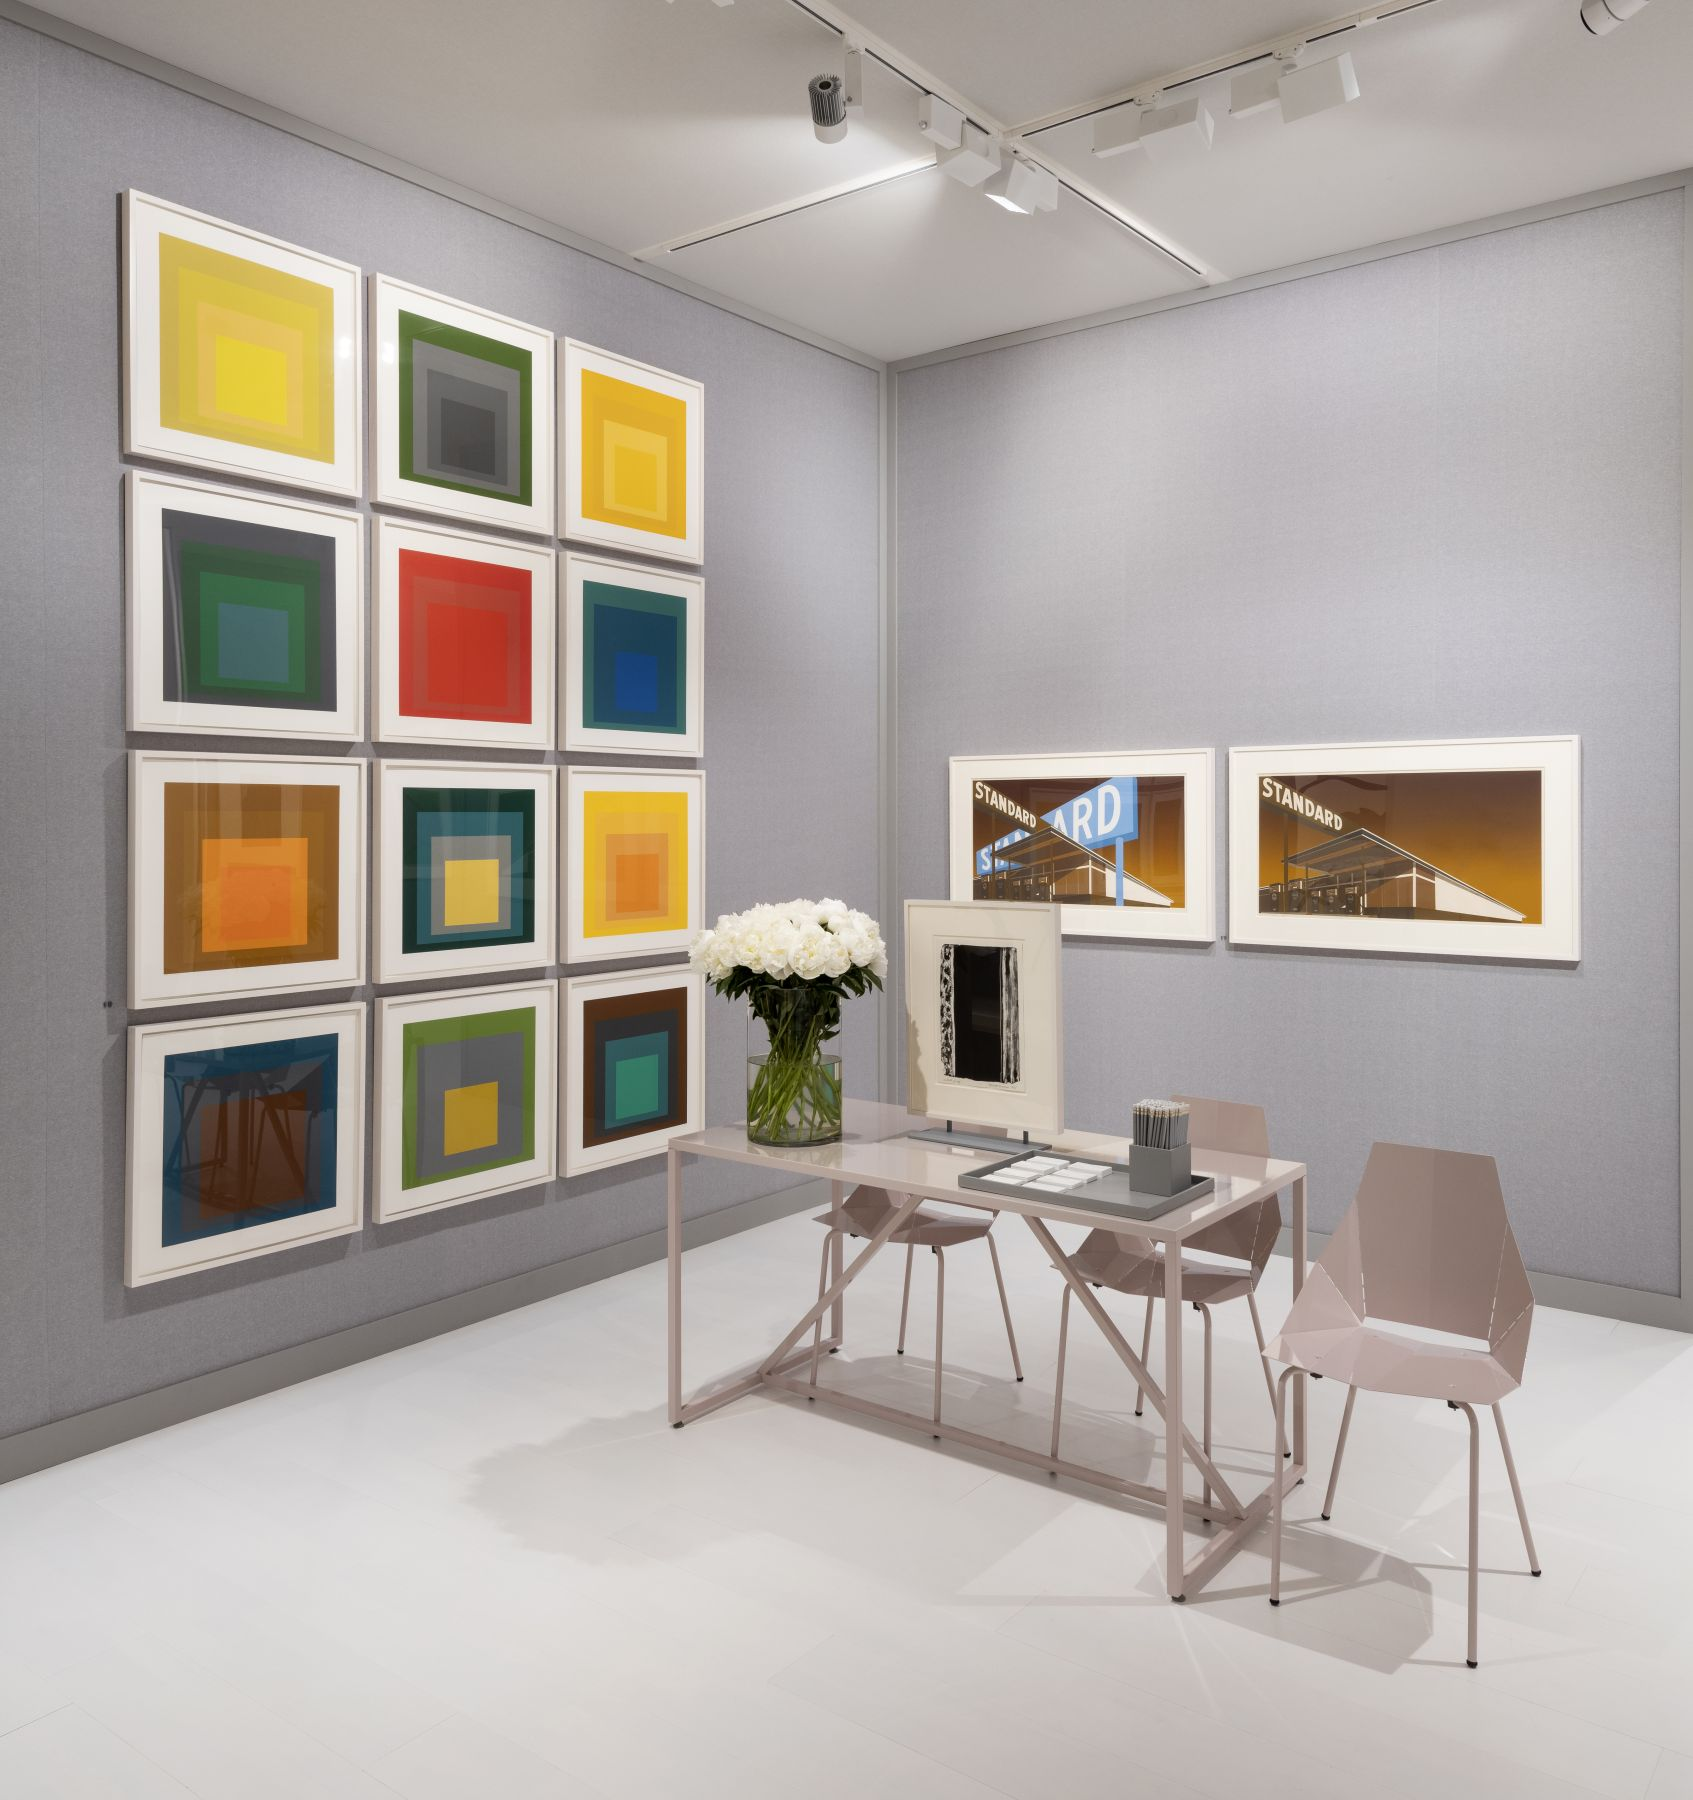 Art Basel 2019 by Susan Sheehan Gallery